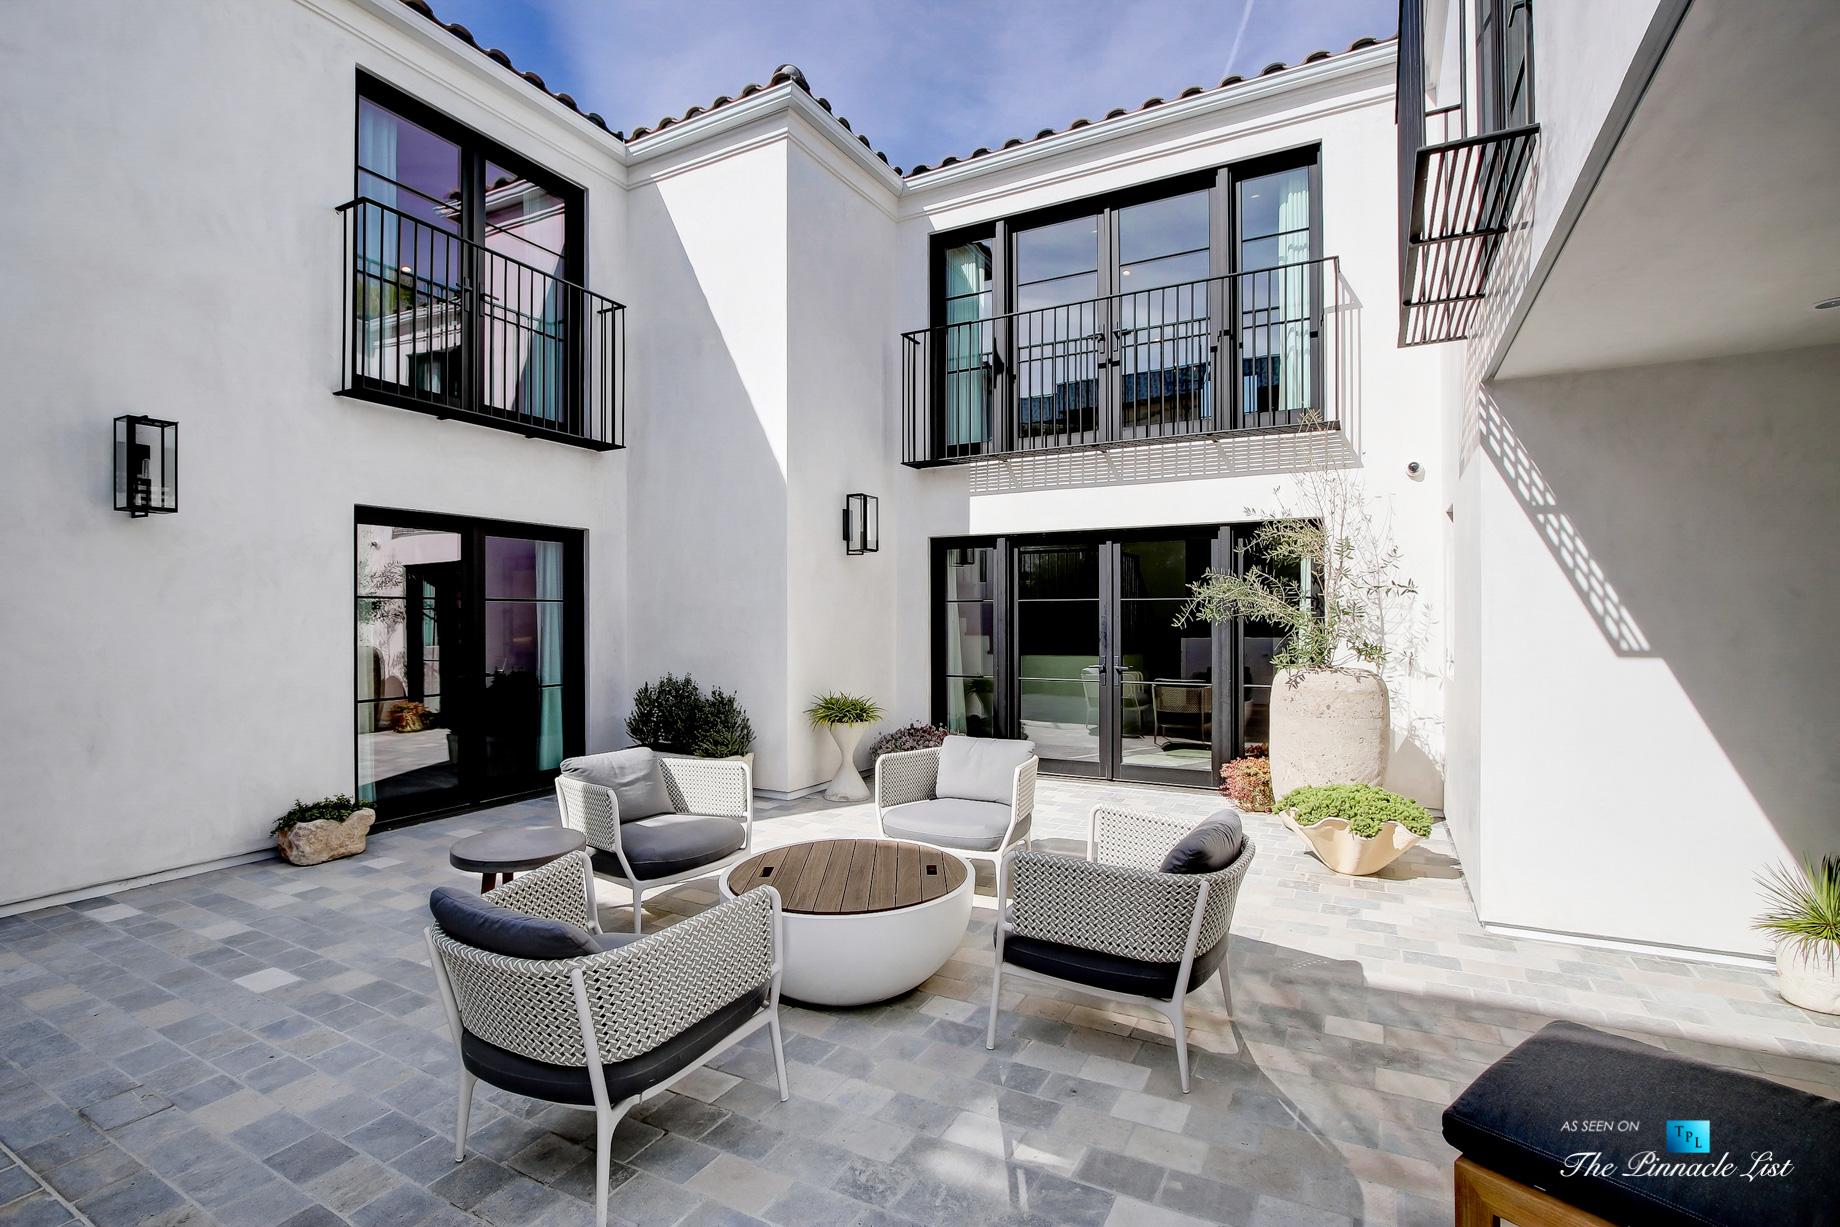 825 Highview Ave, Manhattan Beach, CA, USA - Private Exterior Courtyard - Luxury Real Estate - Modern Spanish Home